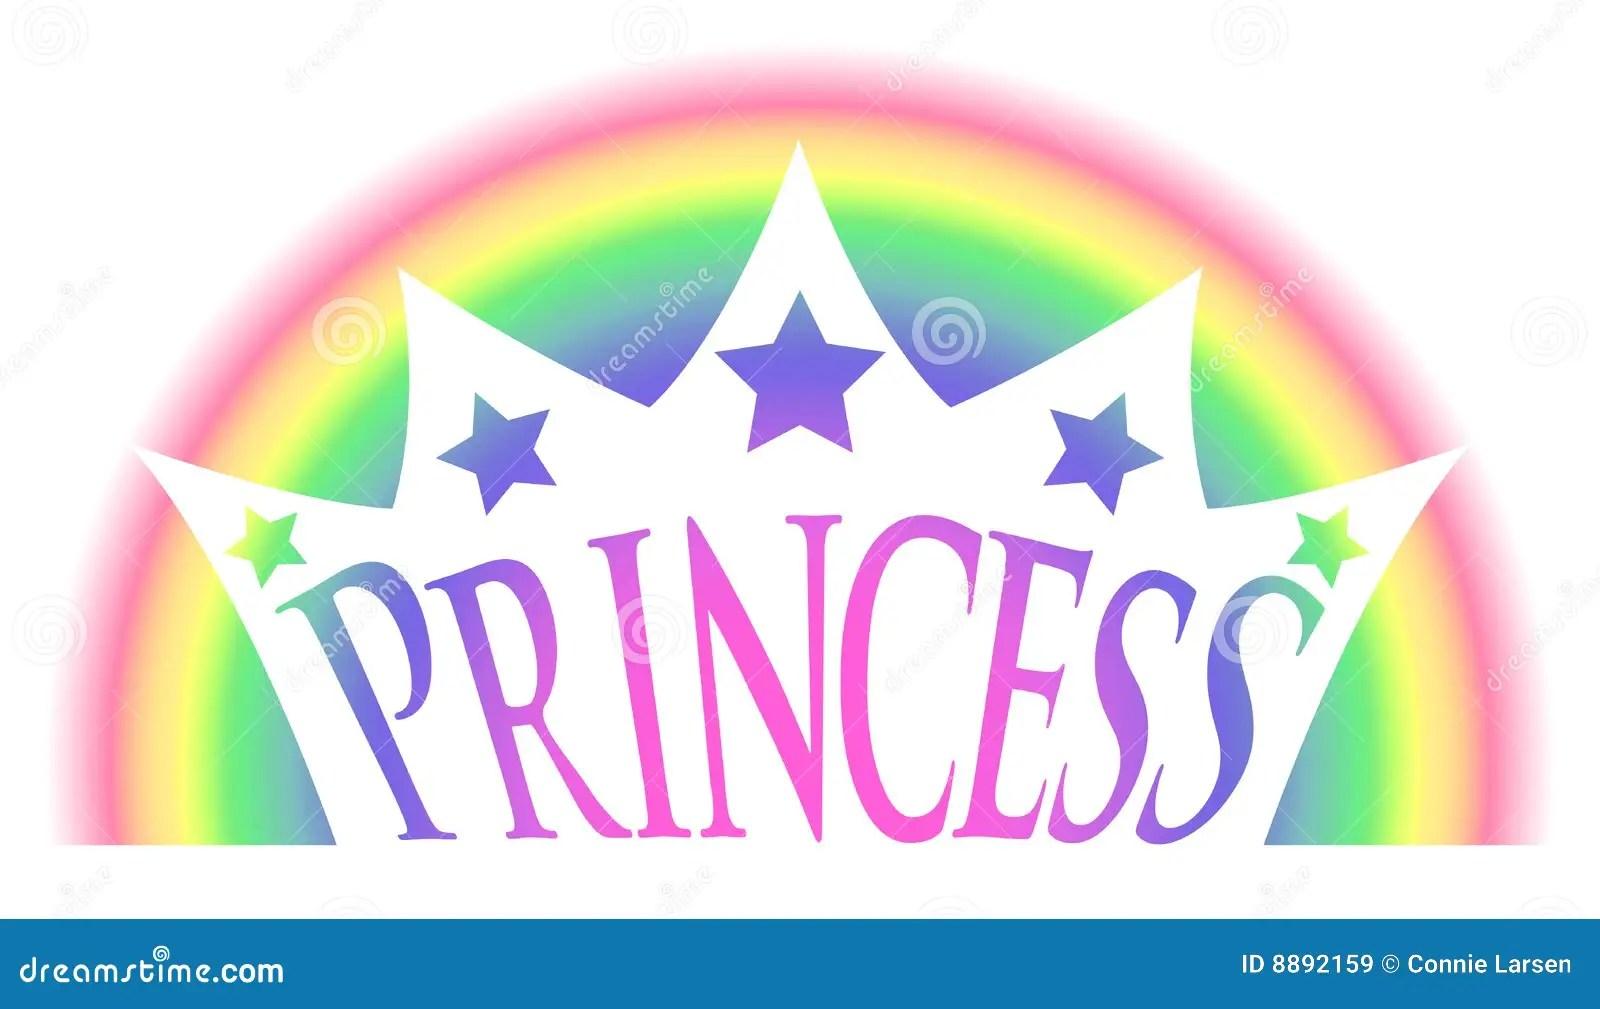 Rainbow Princess Crown Royalty Free Stock Images Image